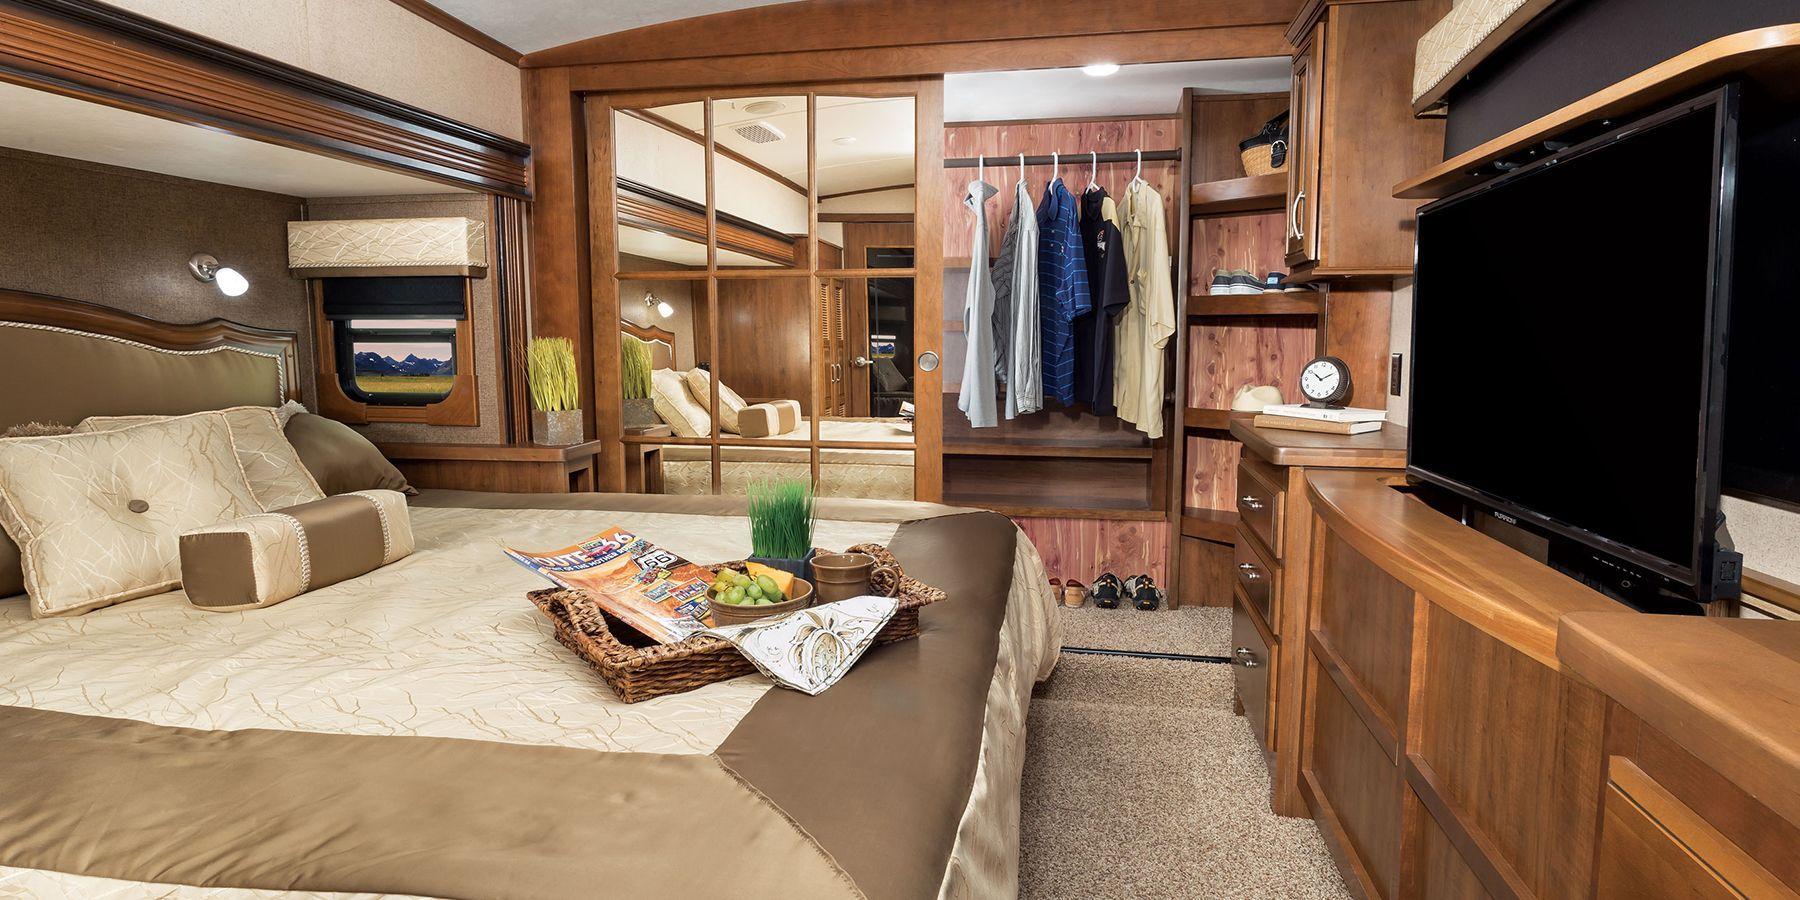 2016 Designer Luxury Fifth Wheel Camper Jayco, Inc